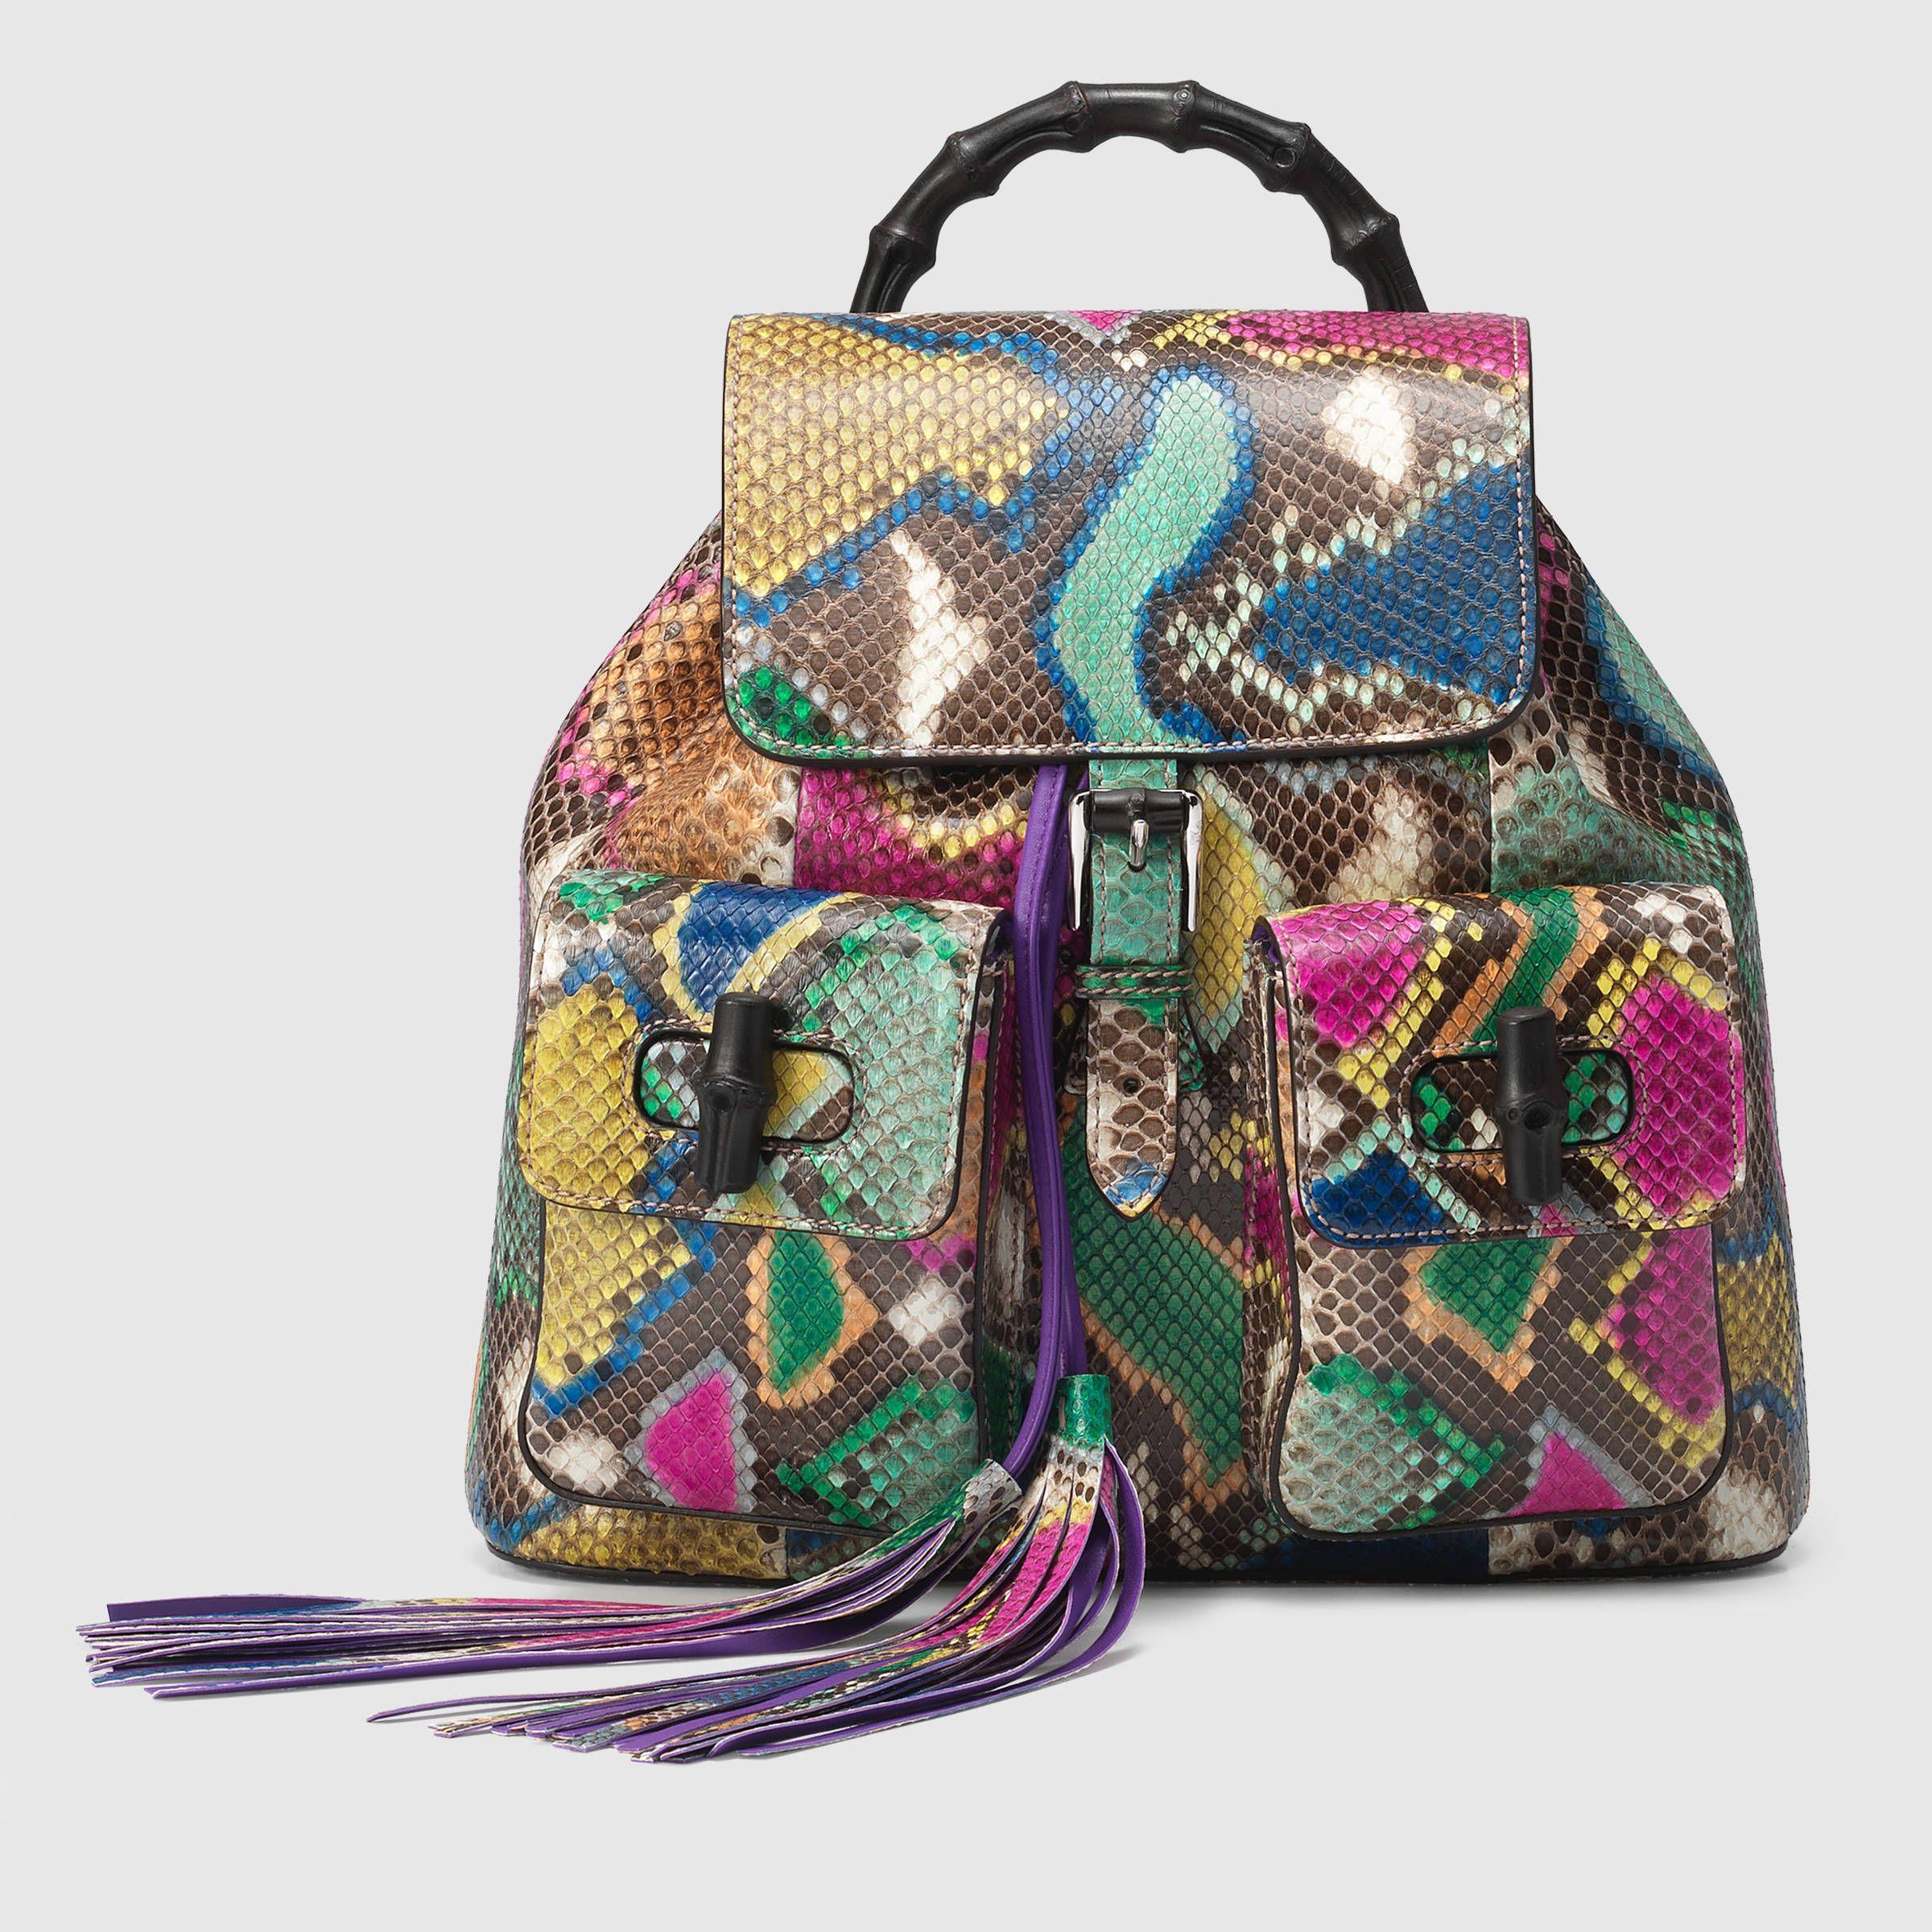 b1a440c3145 Gucci Women - Bamboo python backpack - 370833EWZ2N9577